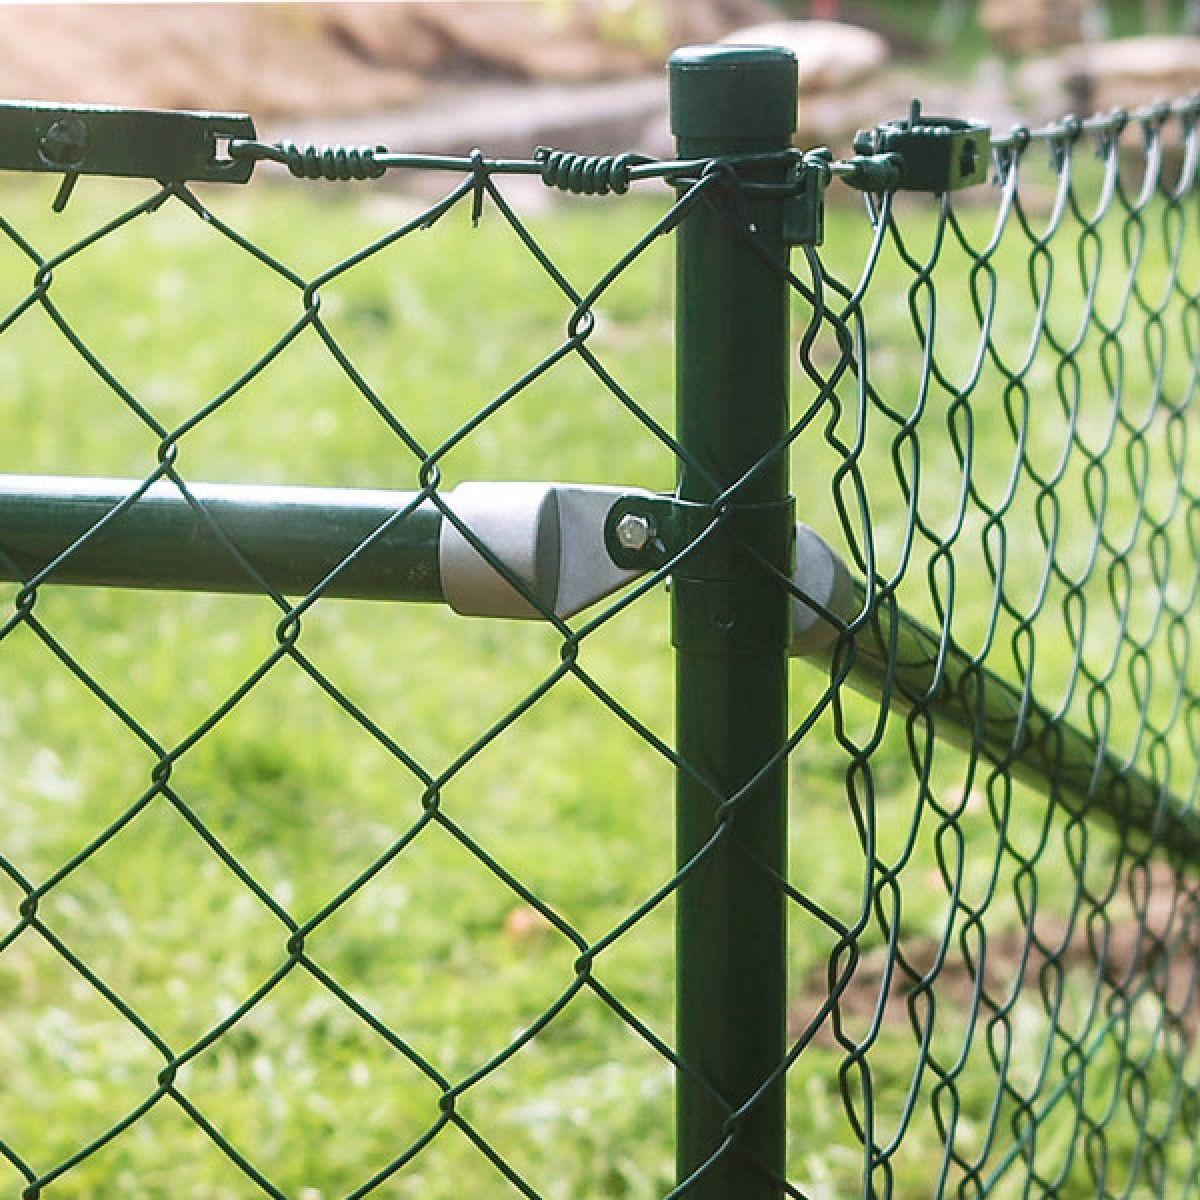 Zaun-Nagel - Einschlagpfosten mit angeschweißter Bodenhülse